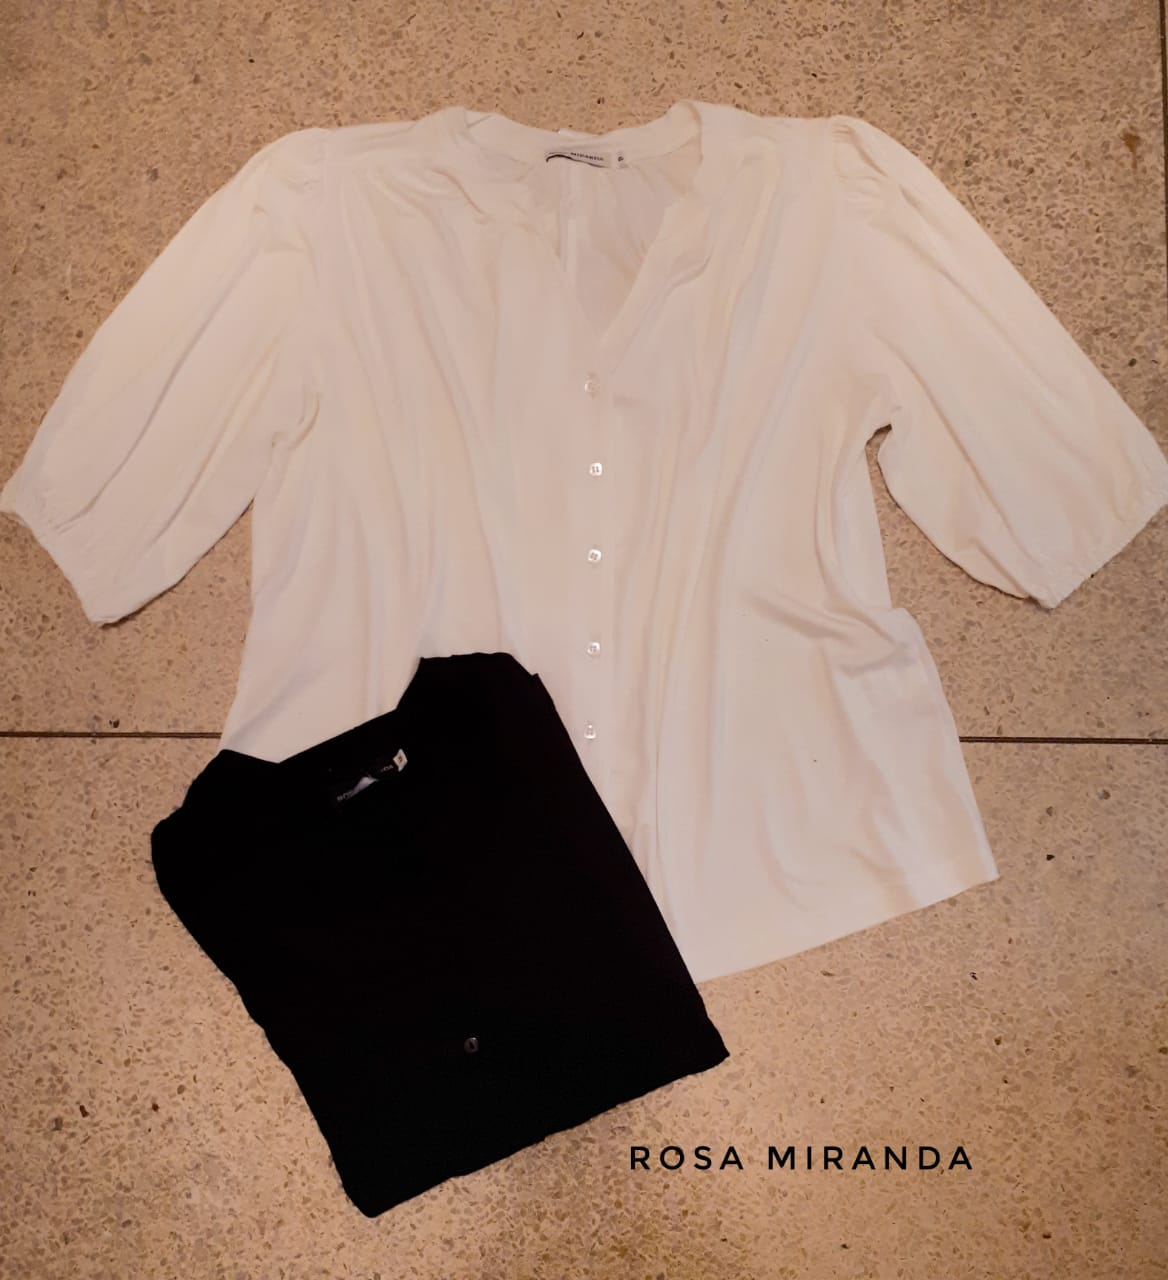 Camisa abotoar manga ampla pelo cotovelo